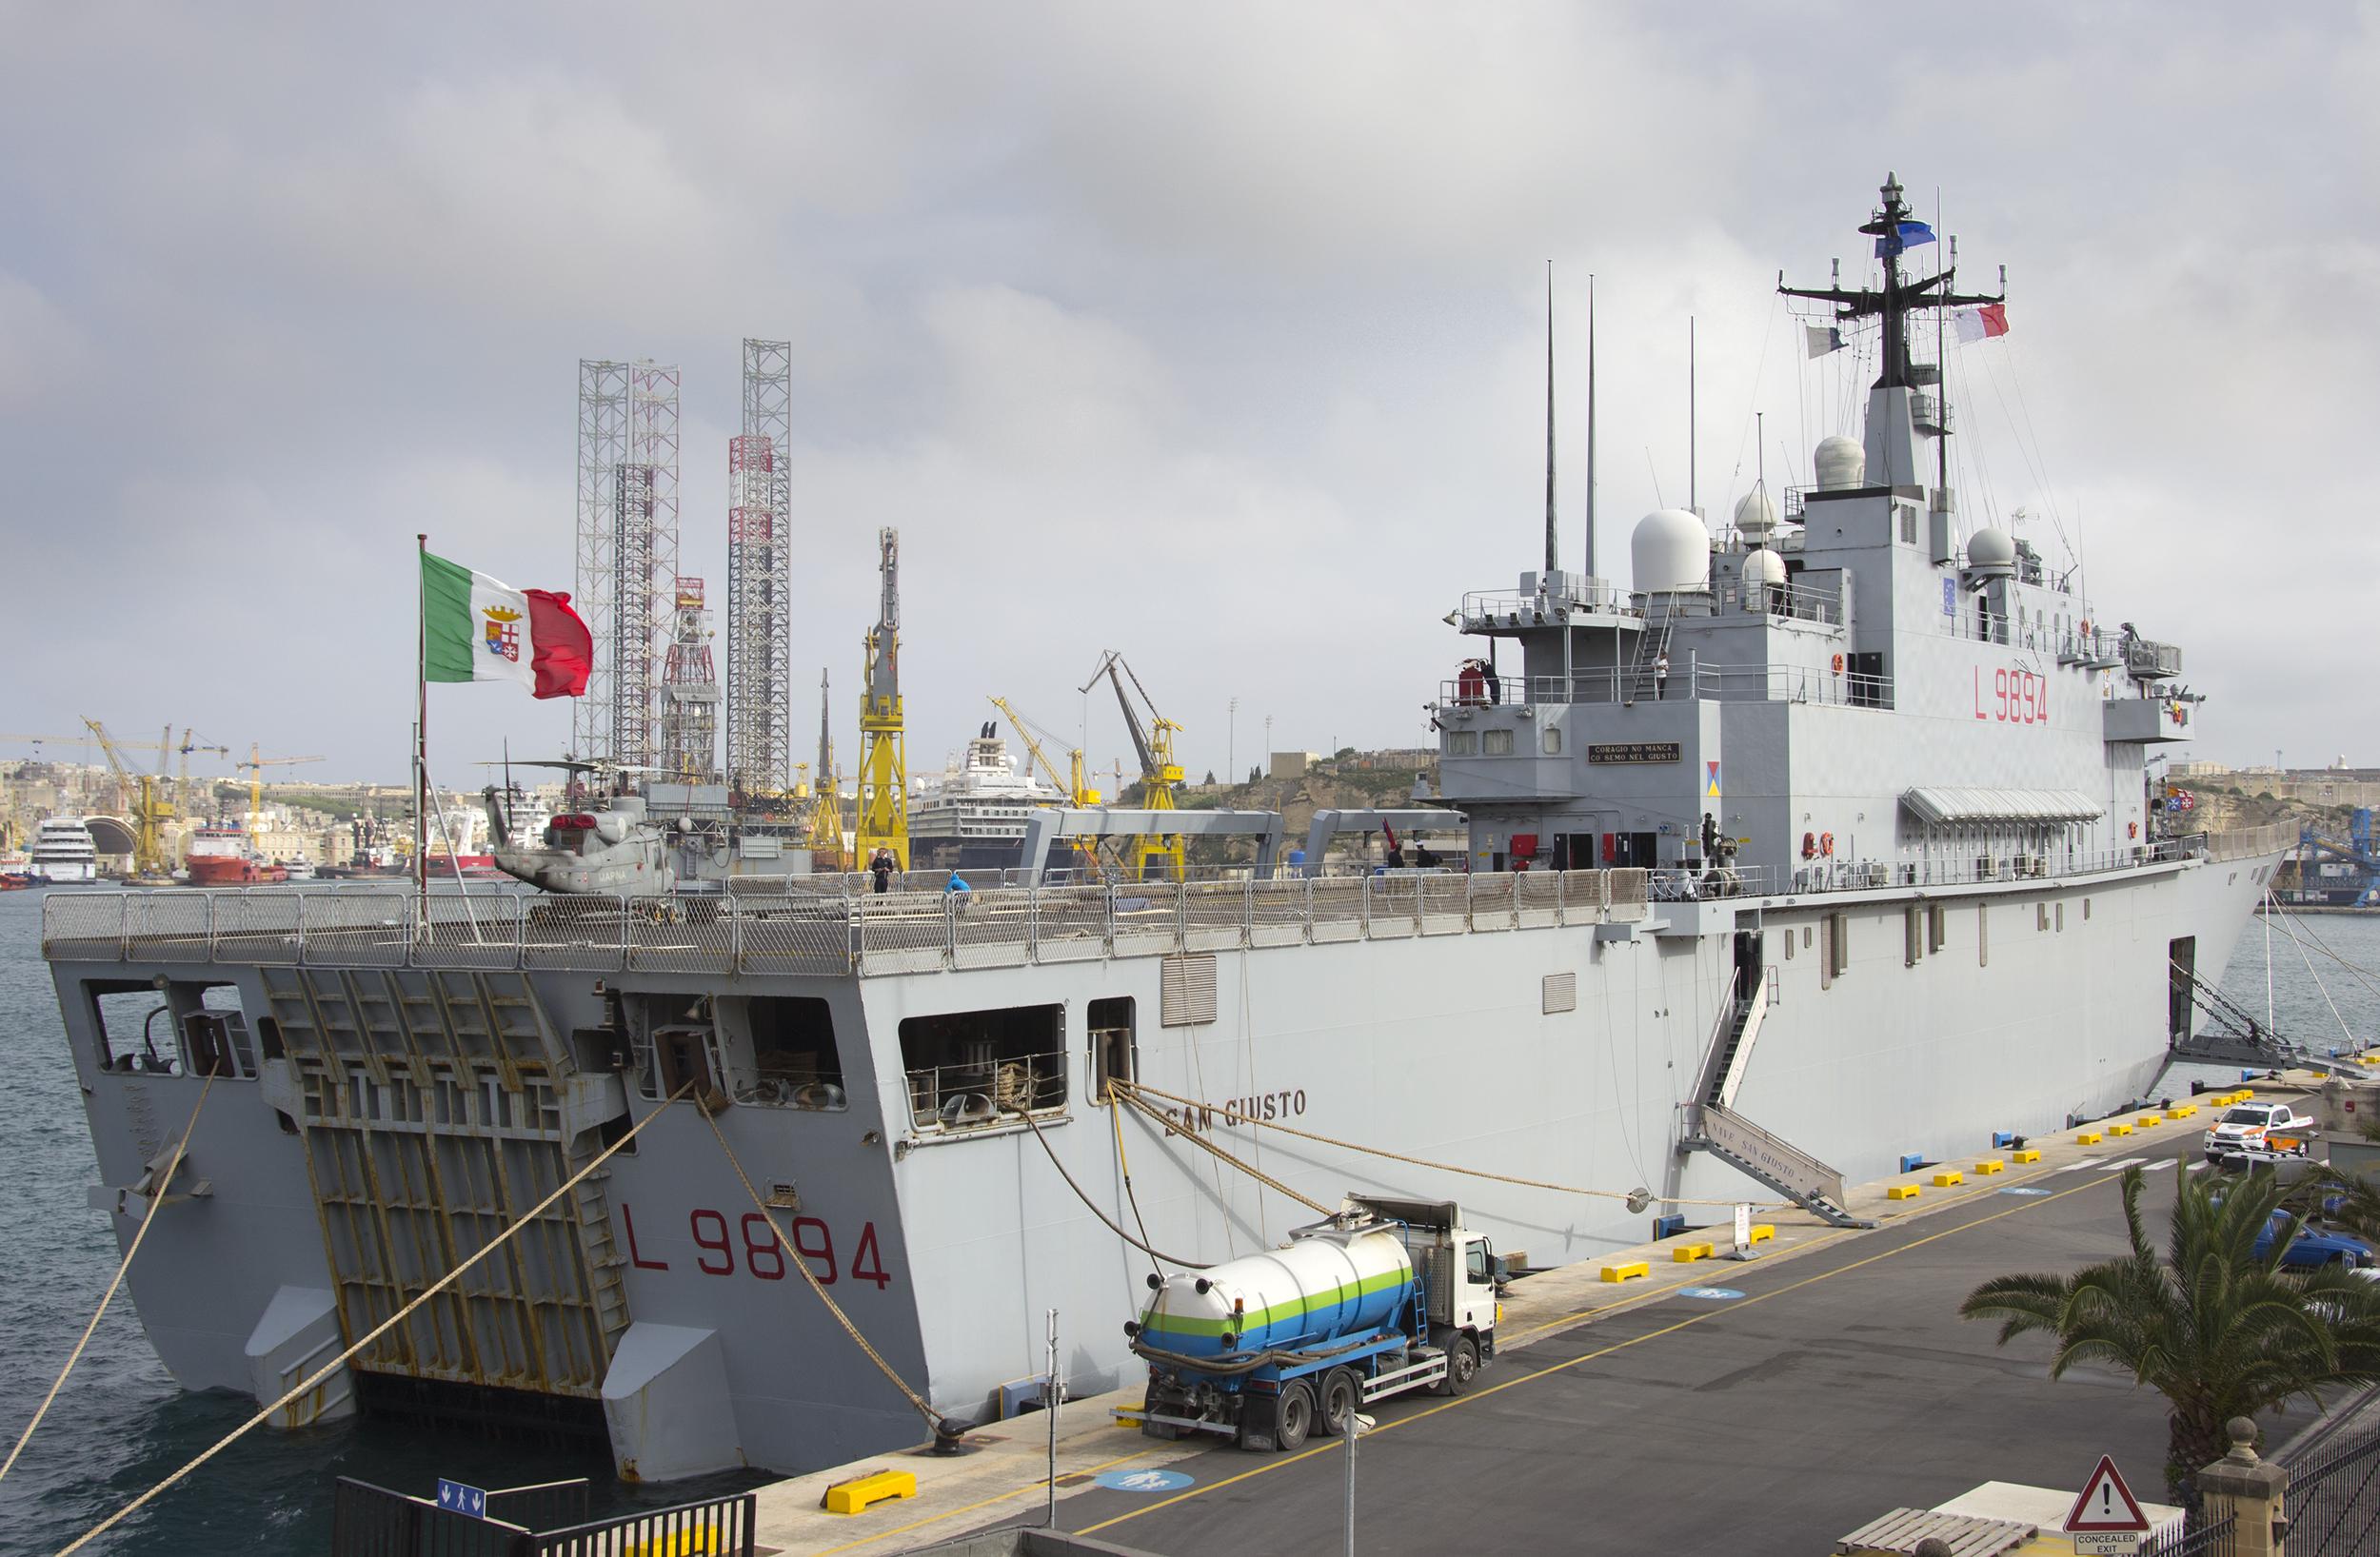 Italian Navy - Marine Italienne - Page 6 33883687840_6995b86c5e_o